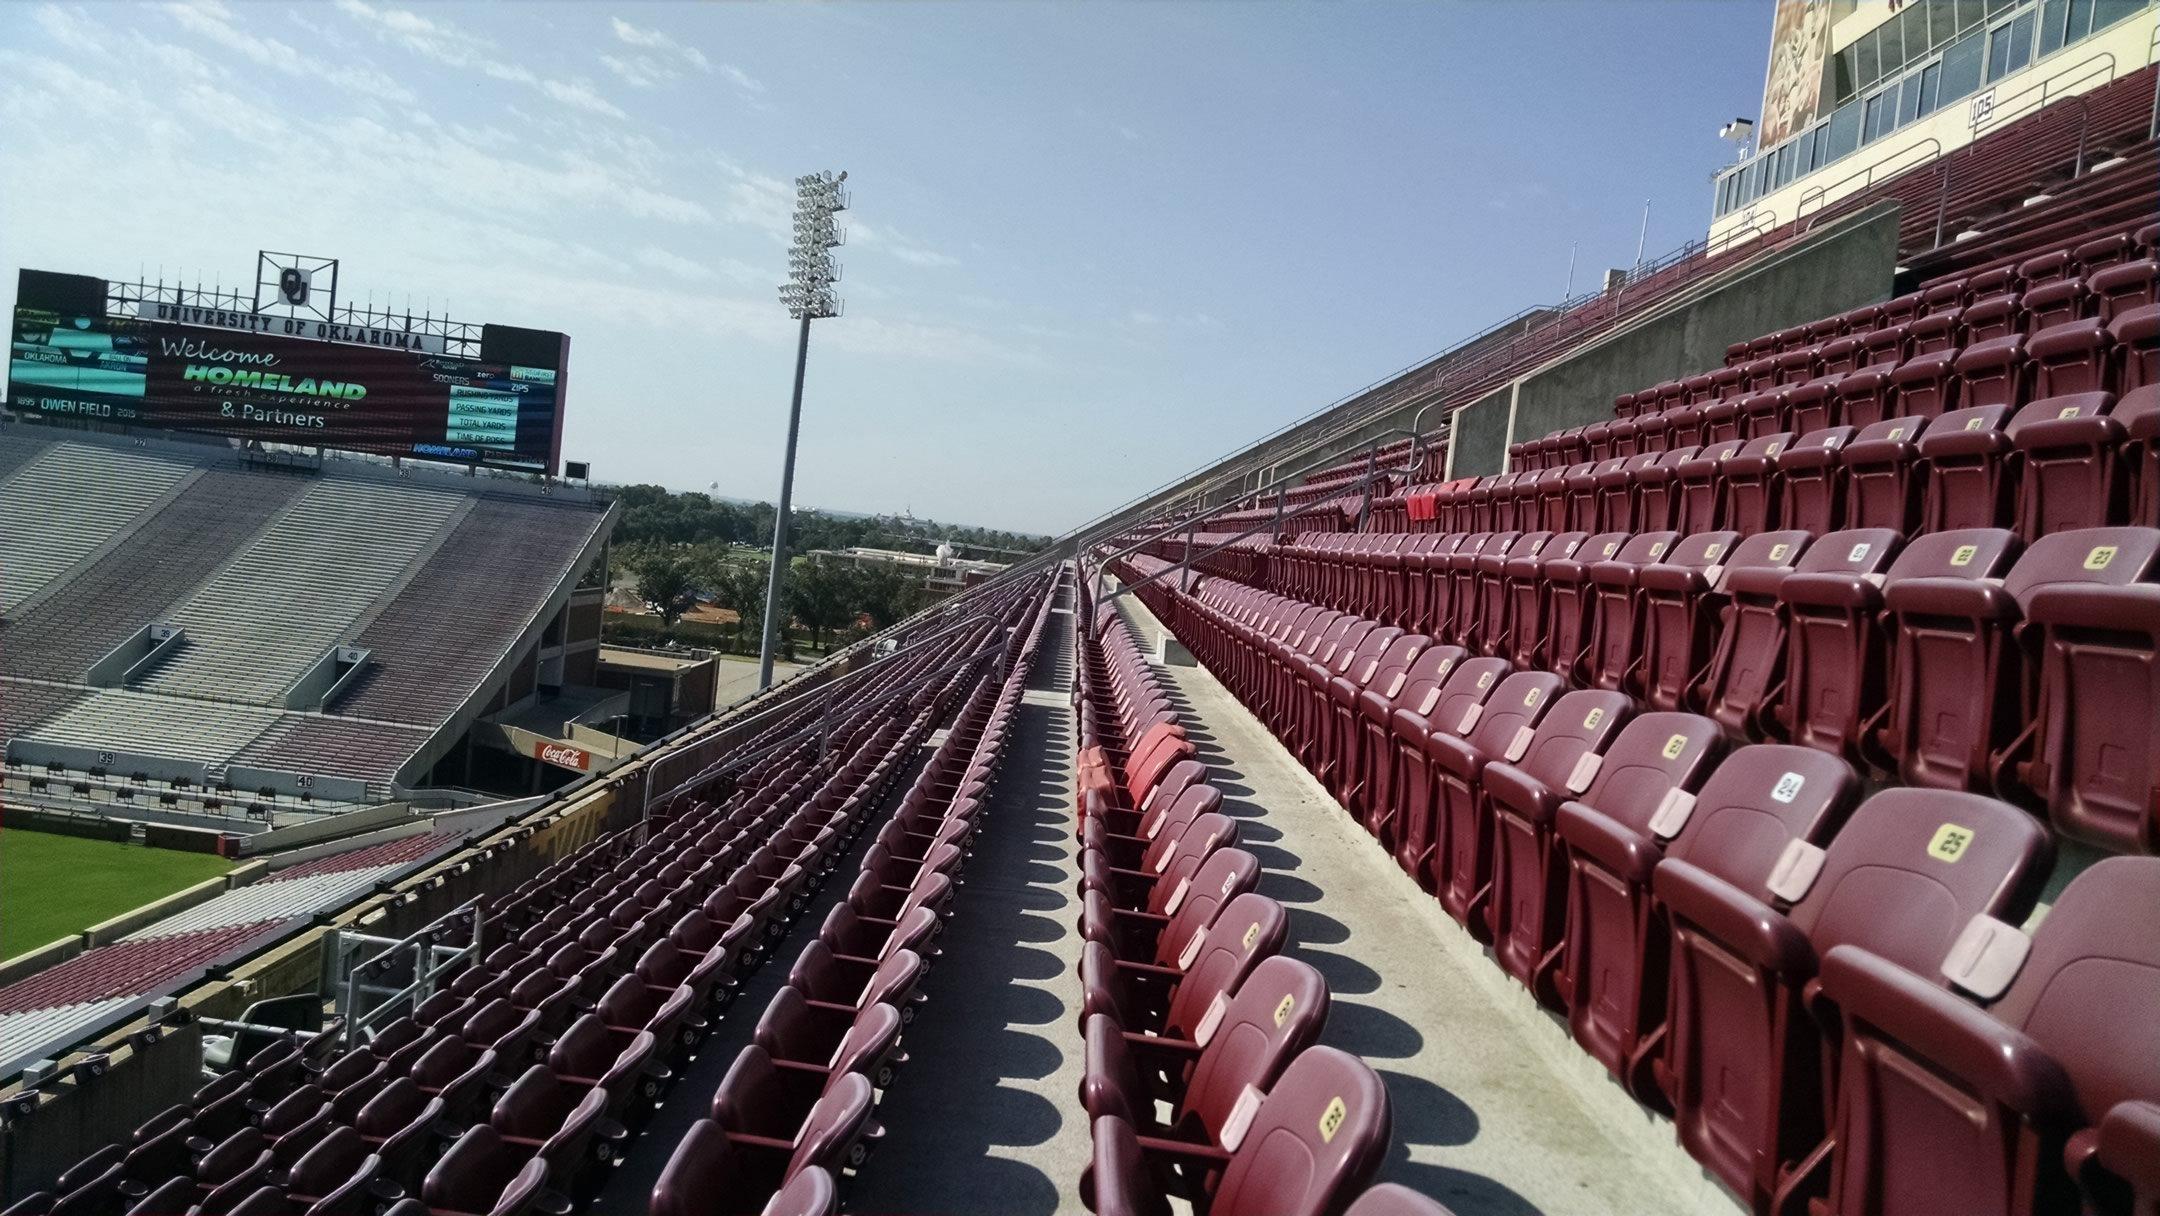 Chairback Seating At Oklahoma Memorial Stadium Rateyourseats Com